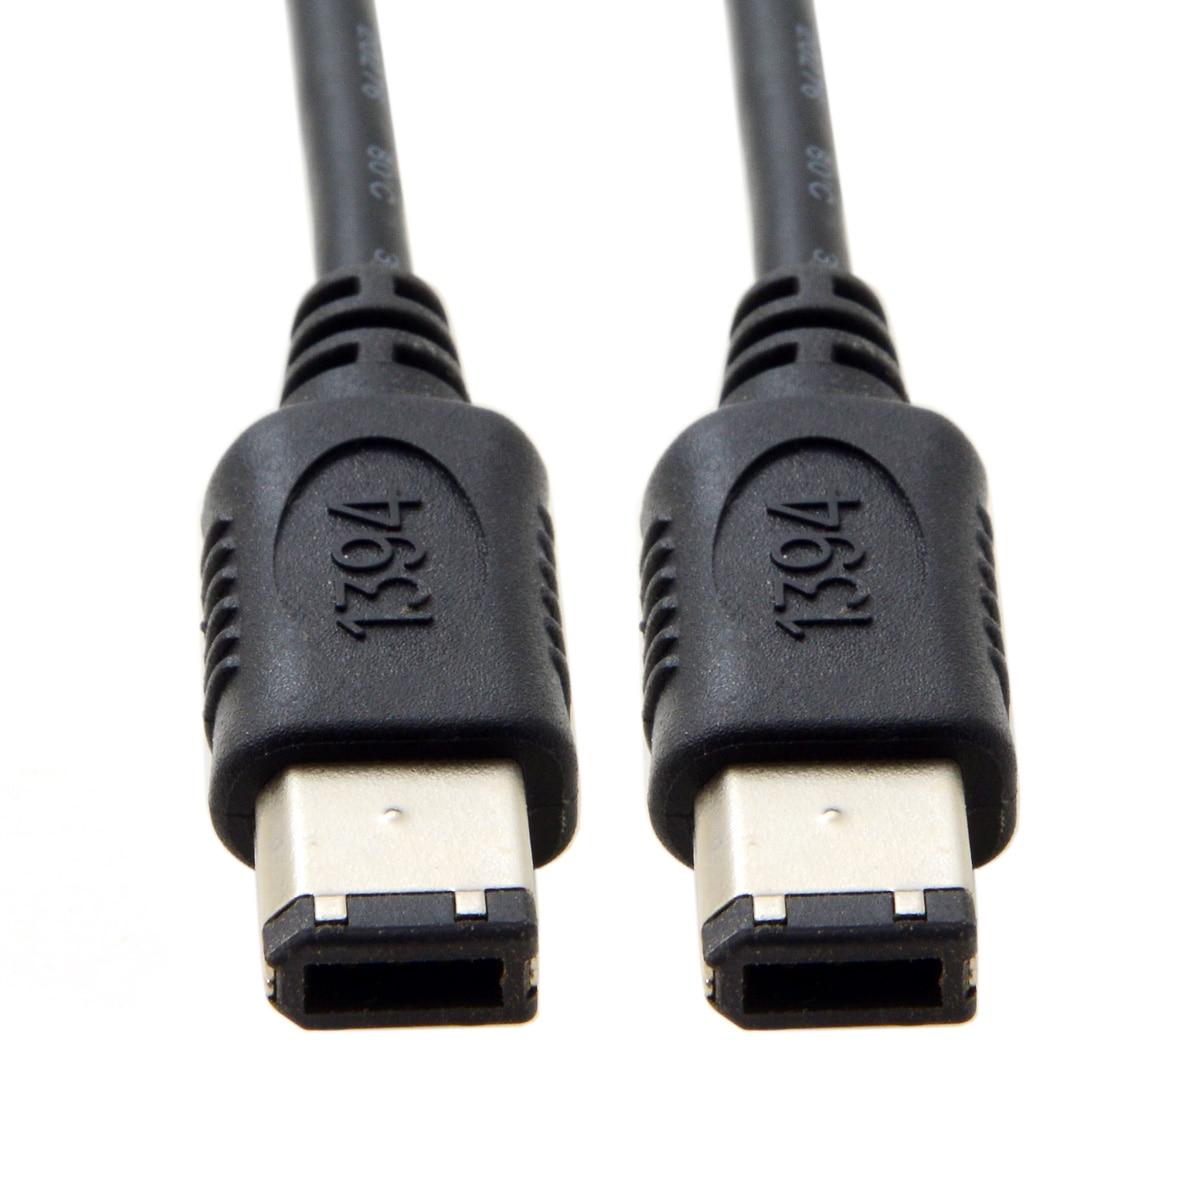 Xiwai Firewire-Cable rápido DV iLink 400 IEEE 1394, 6 pines, macho a...